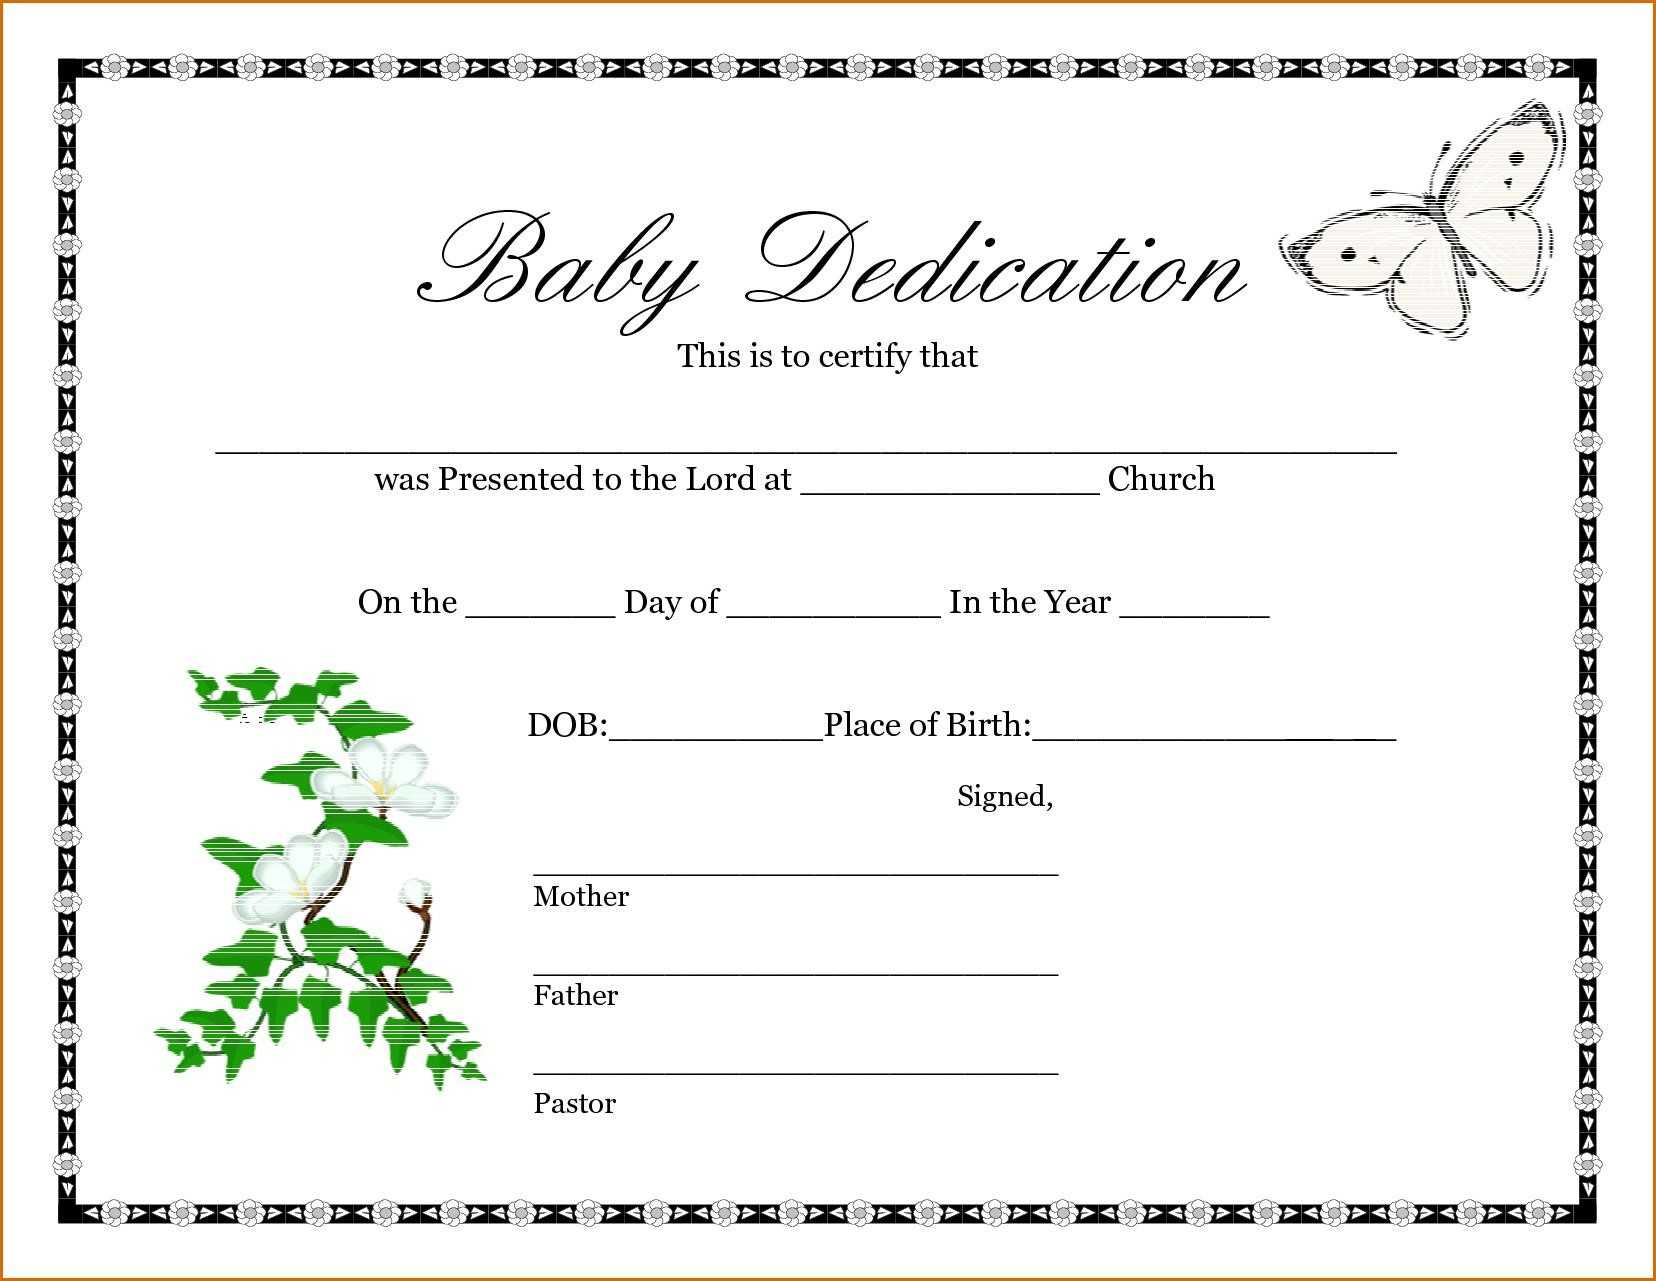 028 Baby Dedication Certificate Template Fake Birth Maker Regarding Fake Birth Certificate Template